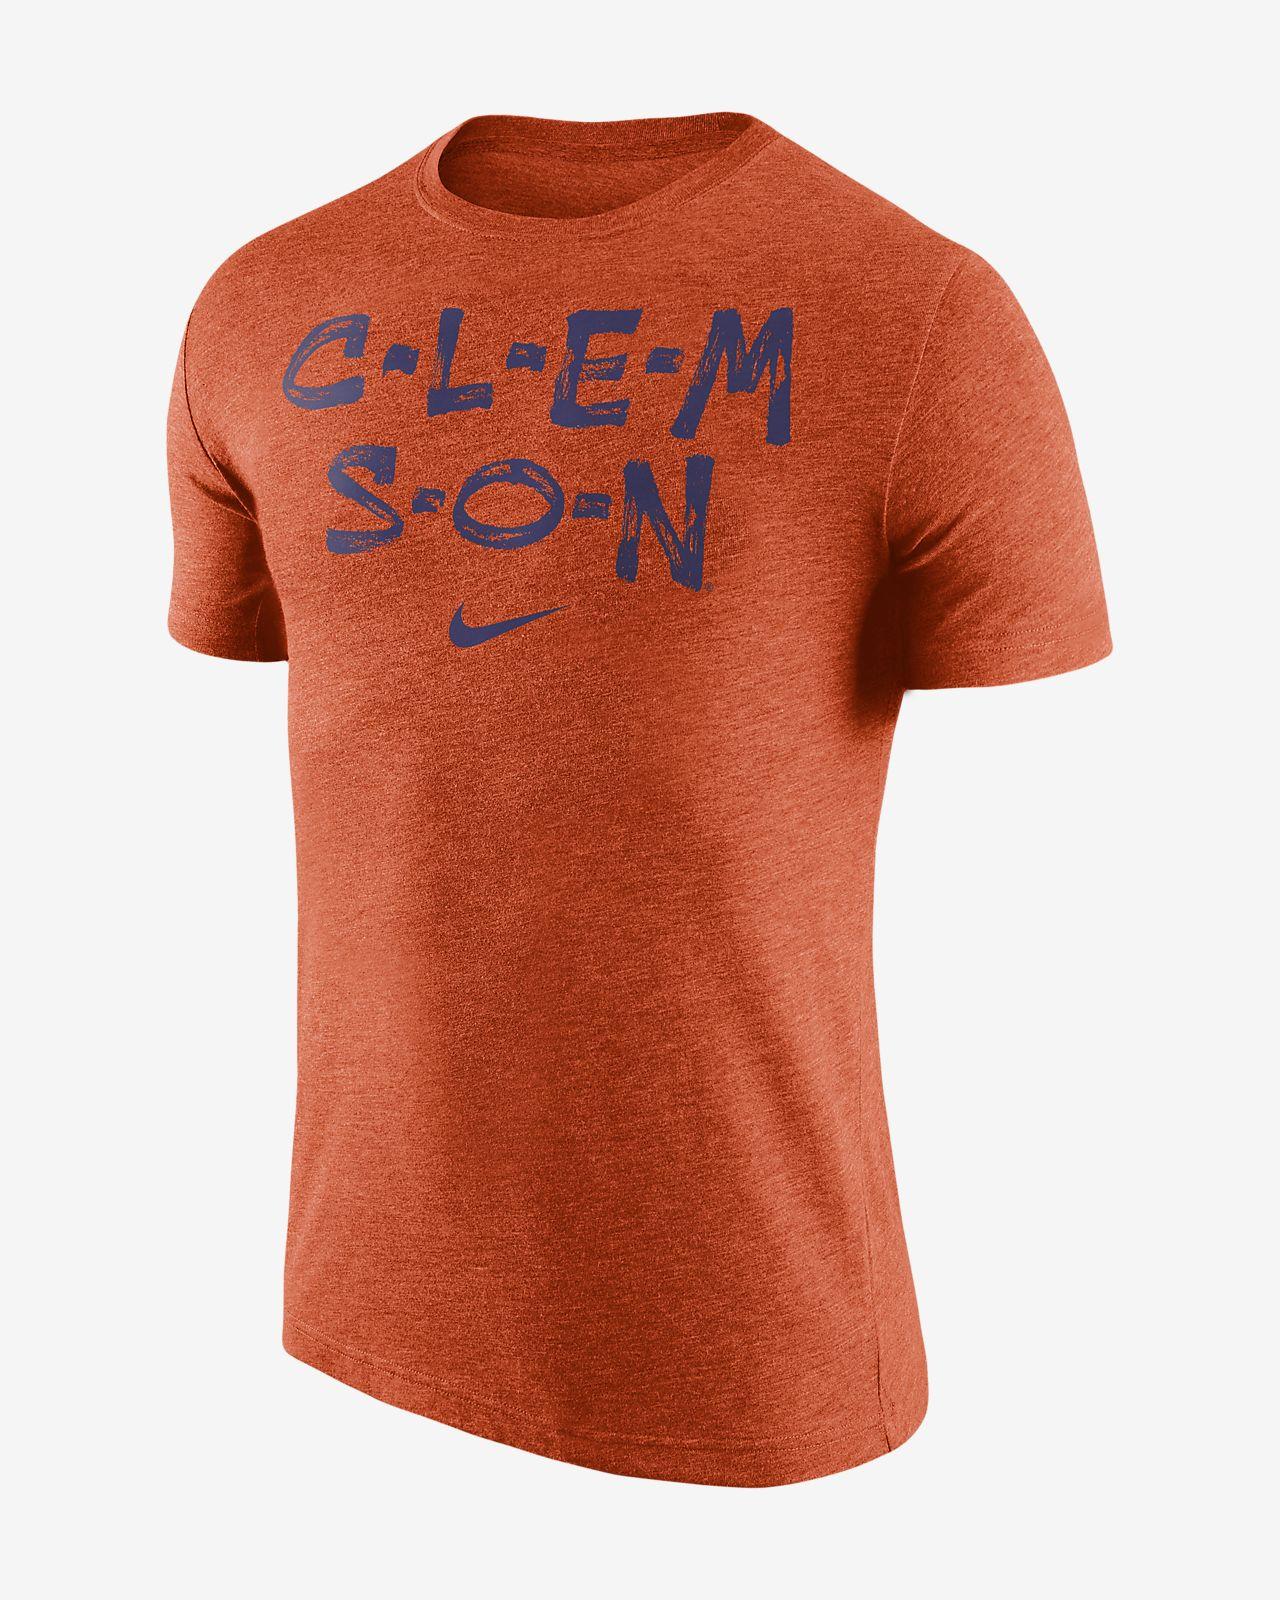 Nike College (Clemson) Men's T-Shirt